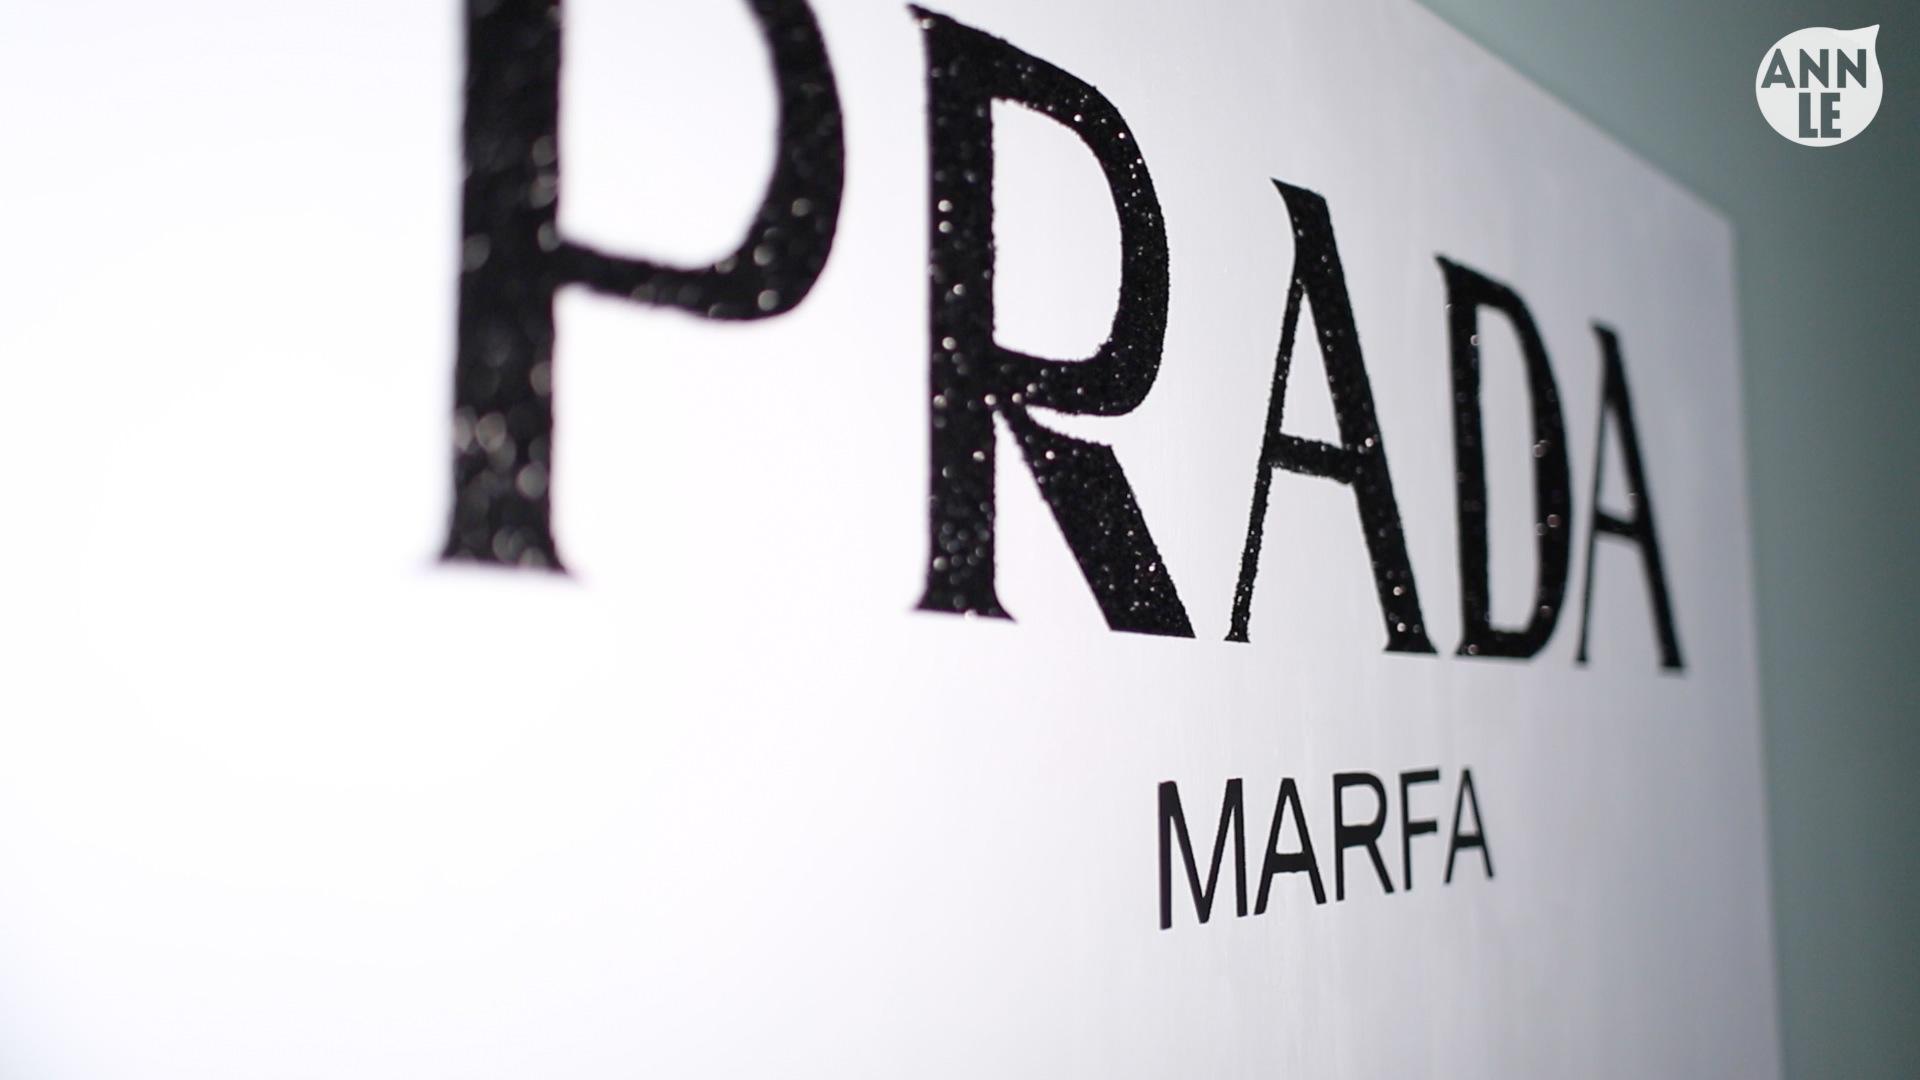 Gossip Girl Prada Wall Art – Ann Le Style intended for Prada Marfa Wall Art